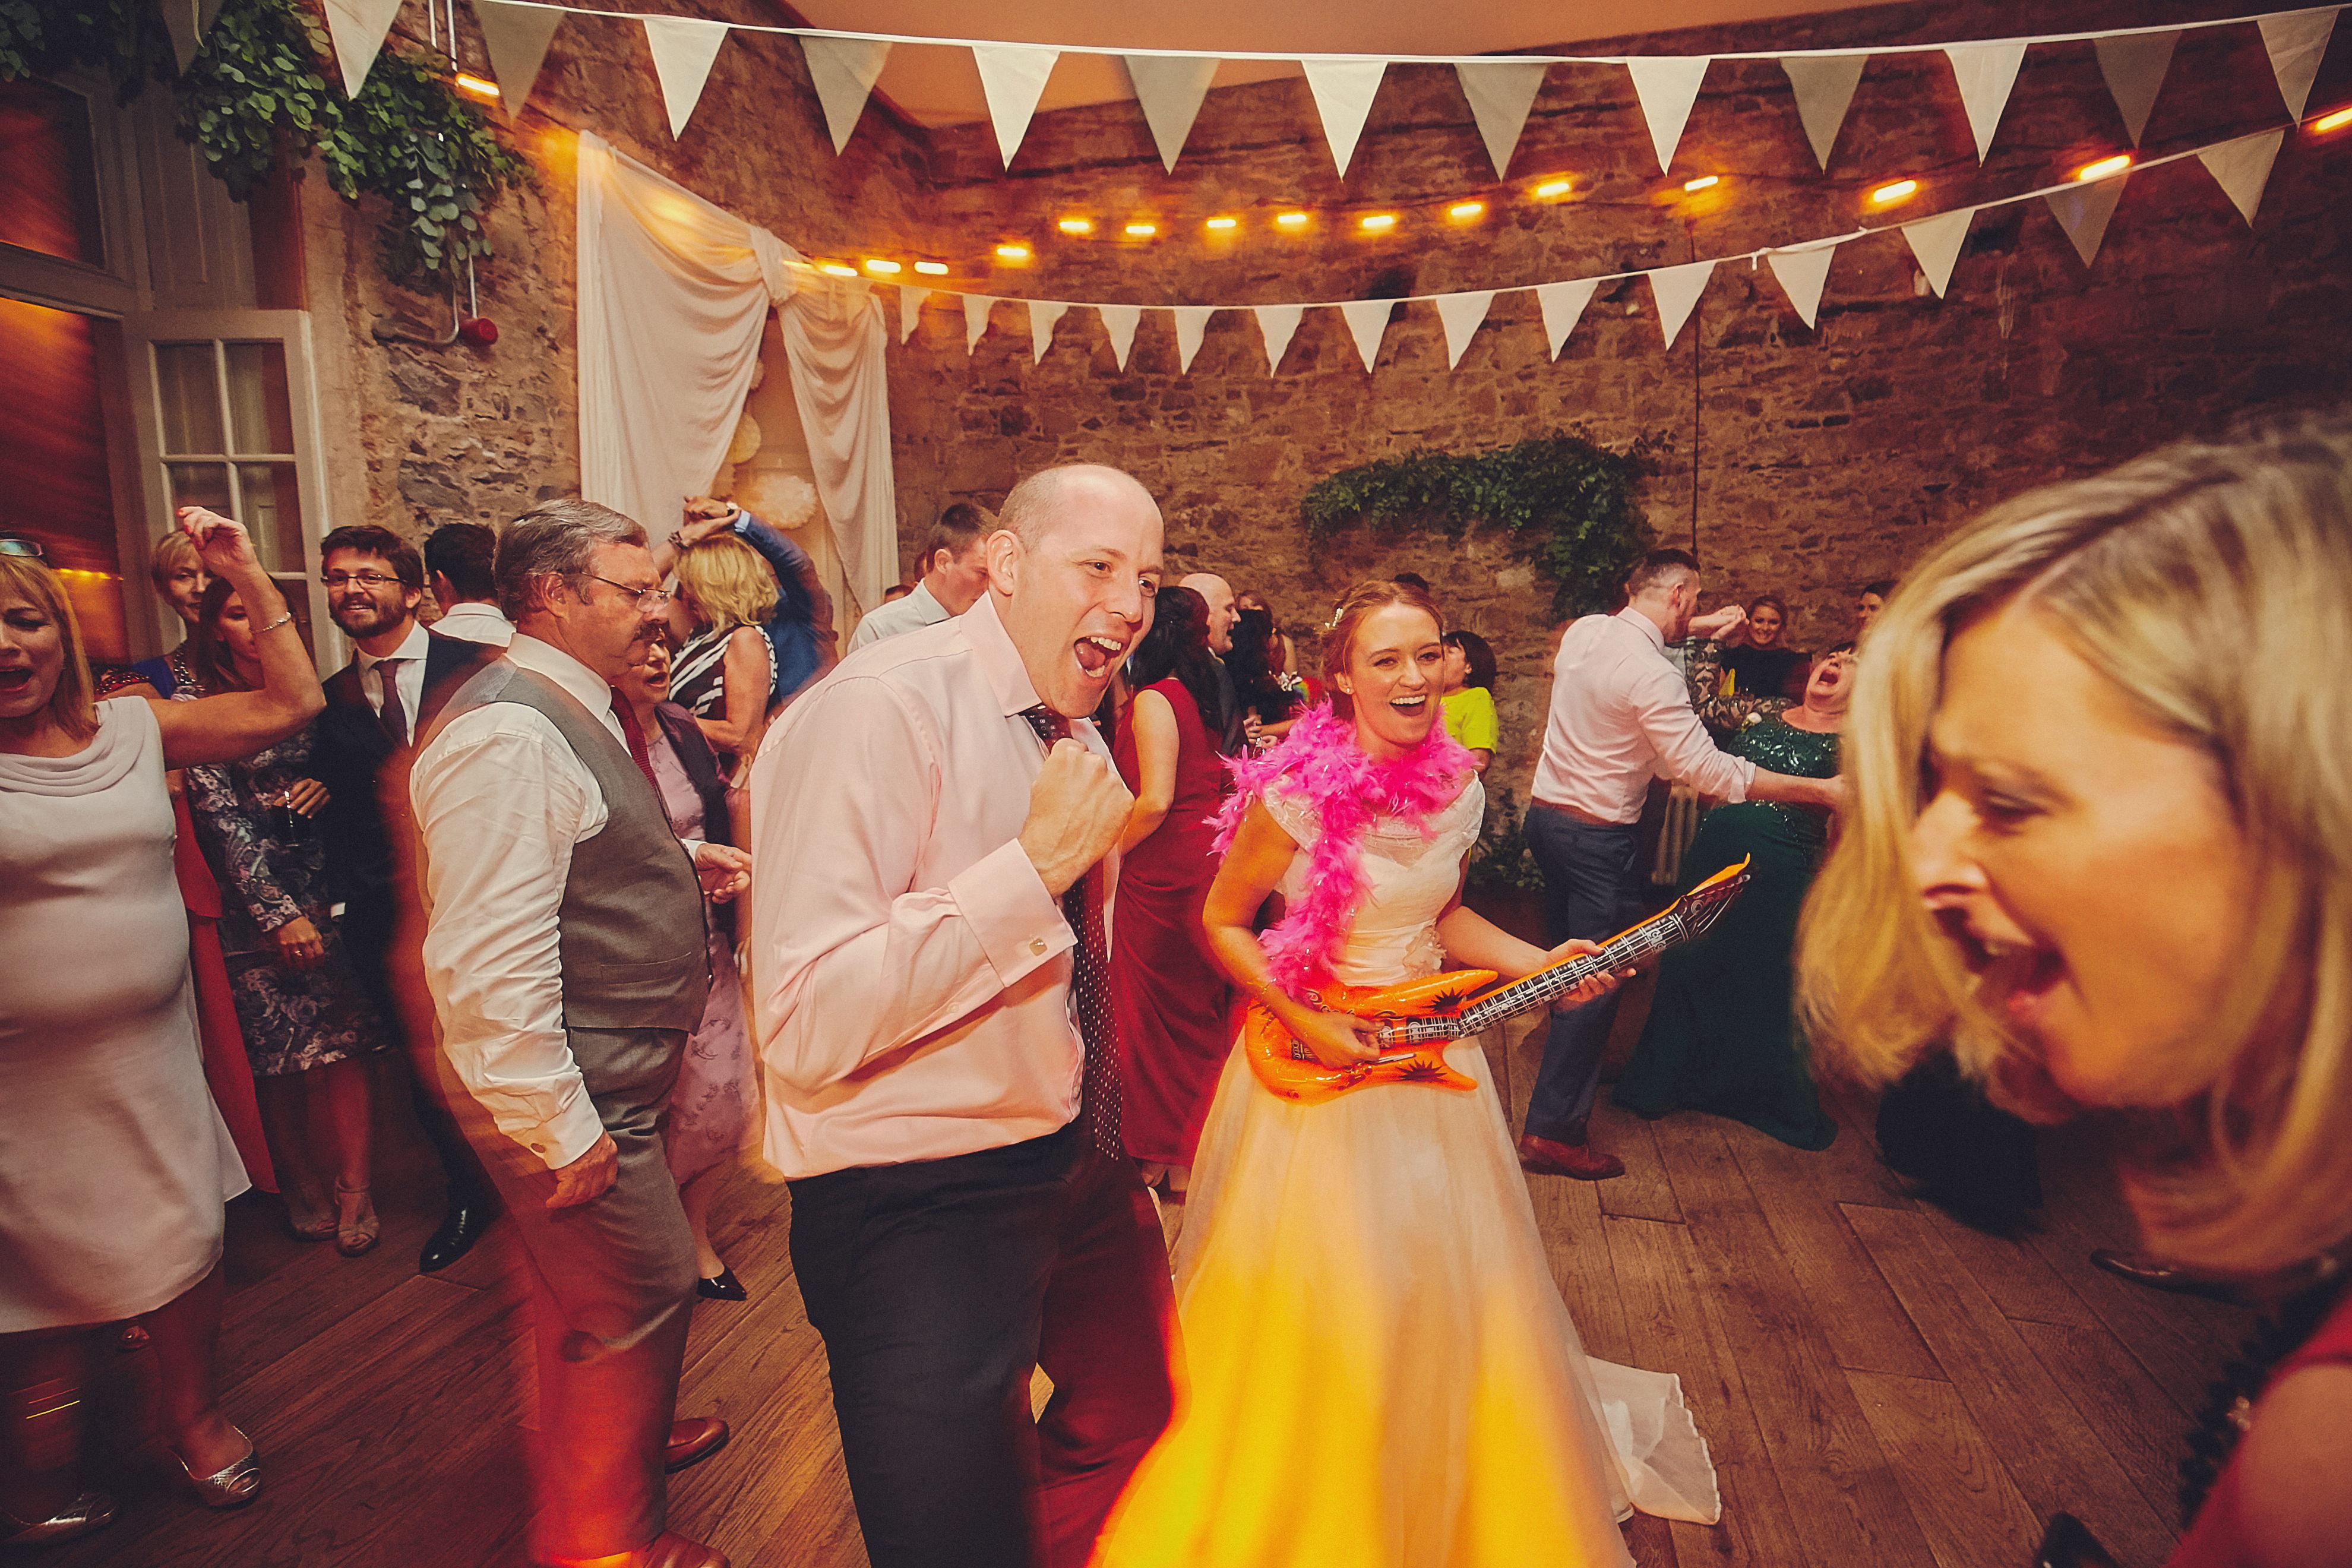 Cloughjordan House weddding165 - Cloughjordan House Wedding - Alternative Venue